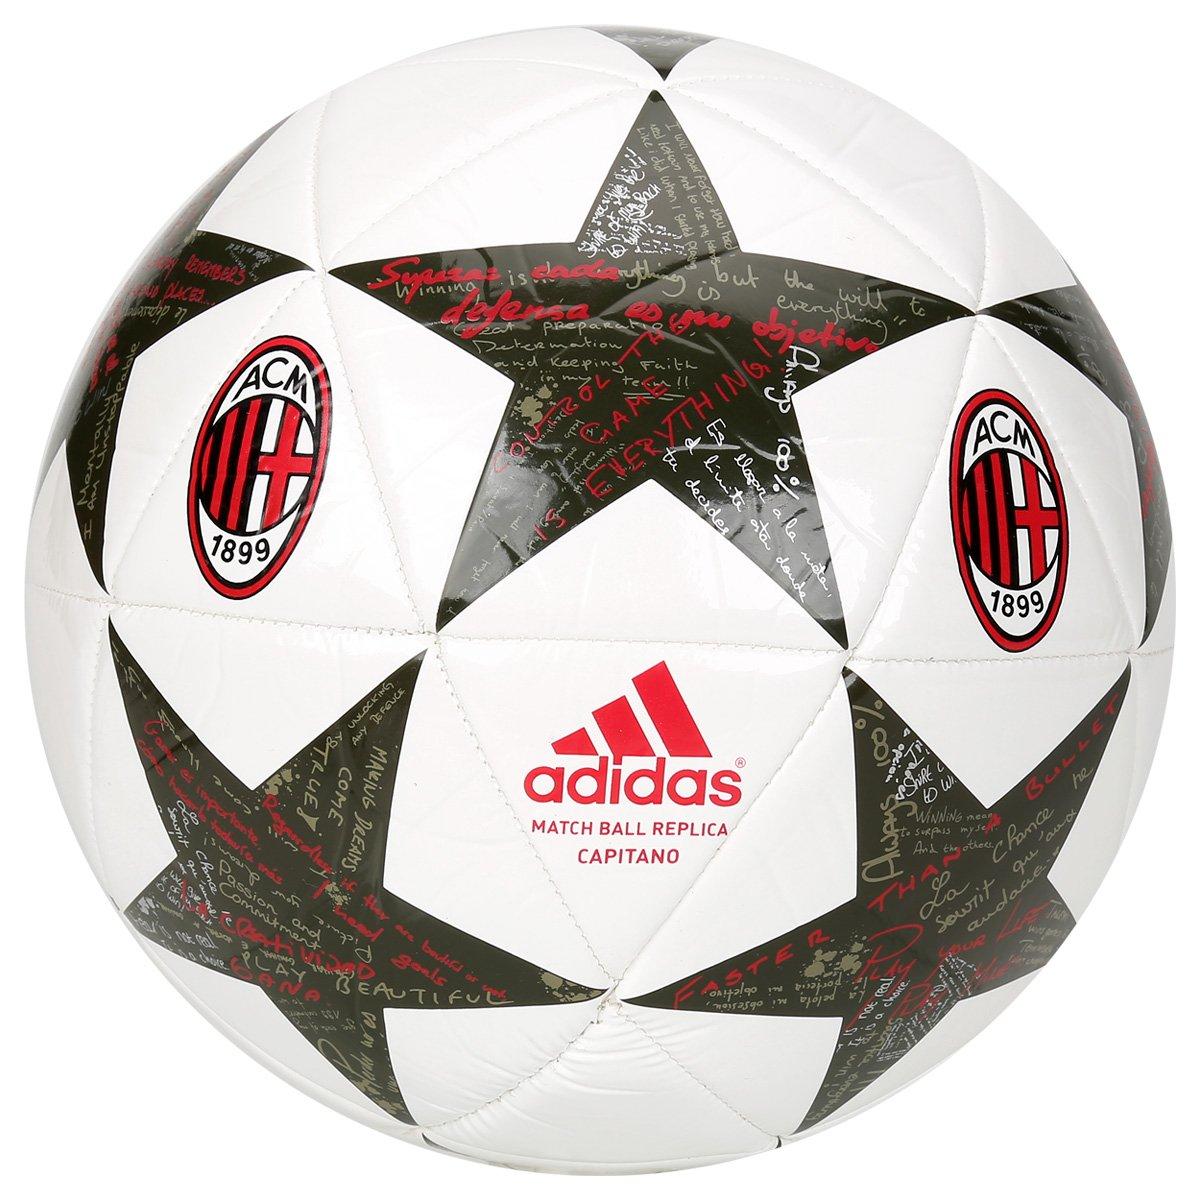 4ffbfda1c2 Bola Futebol Adidas Finale Milan Capitano 2016 Campo - Compre Agora ...